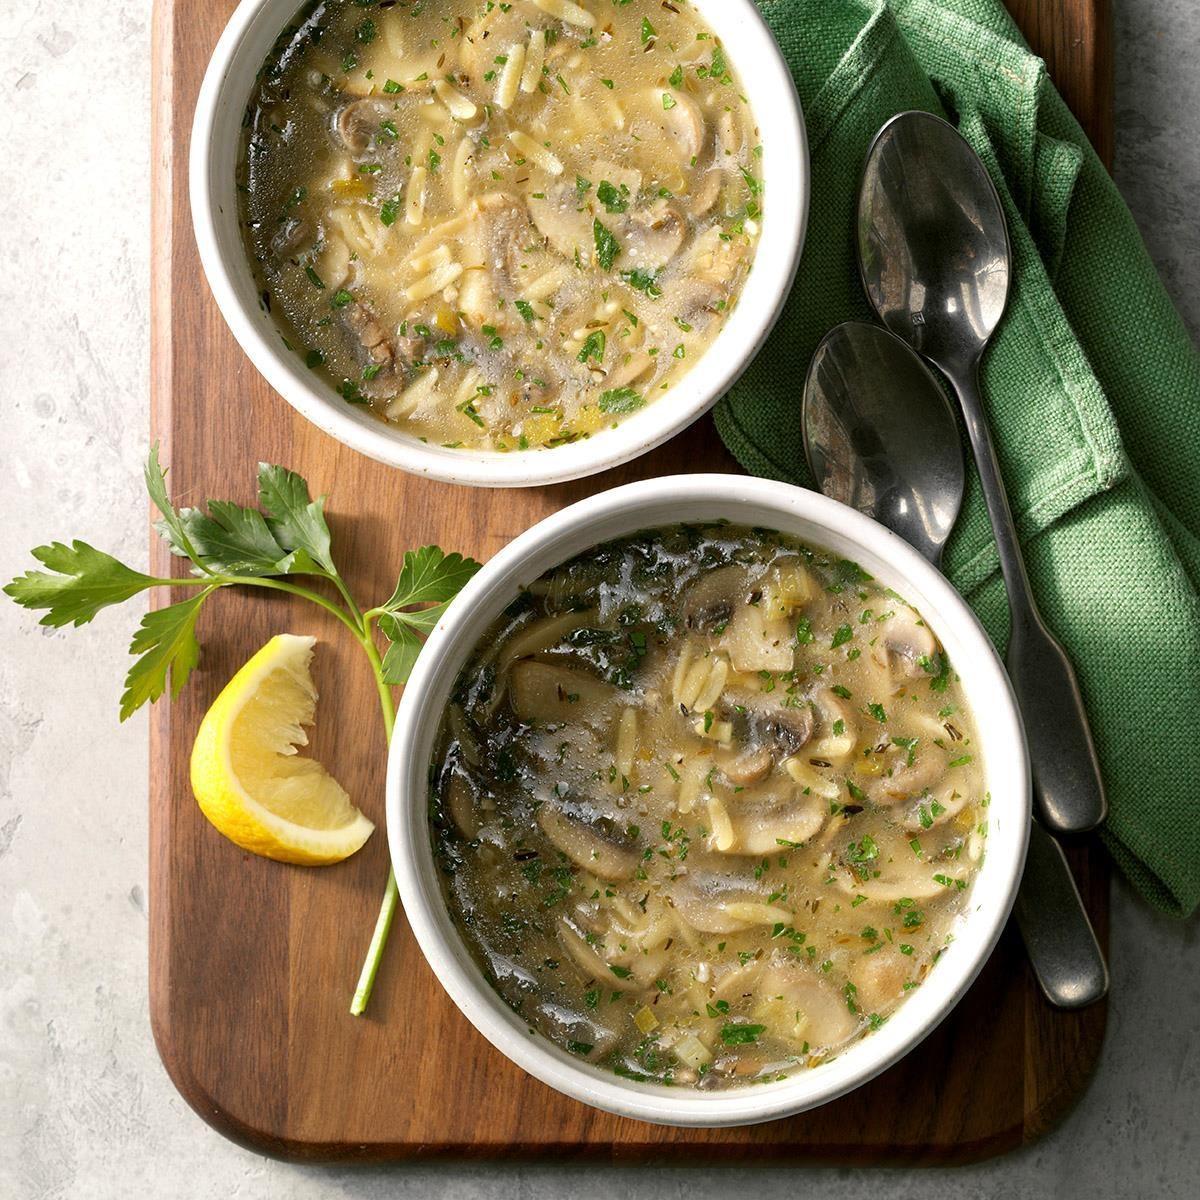 Colorado: Lemony Mushroom-Orzo Soup